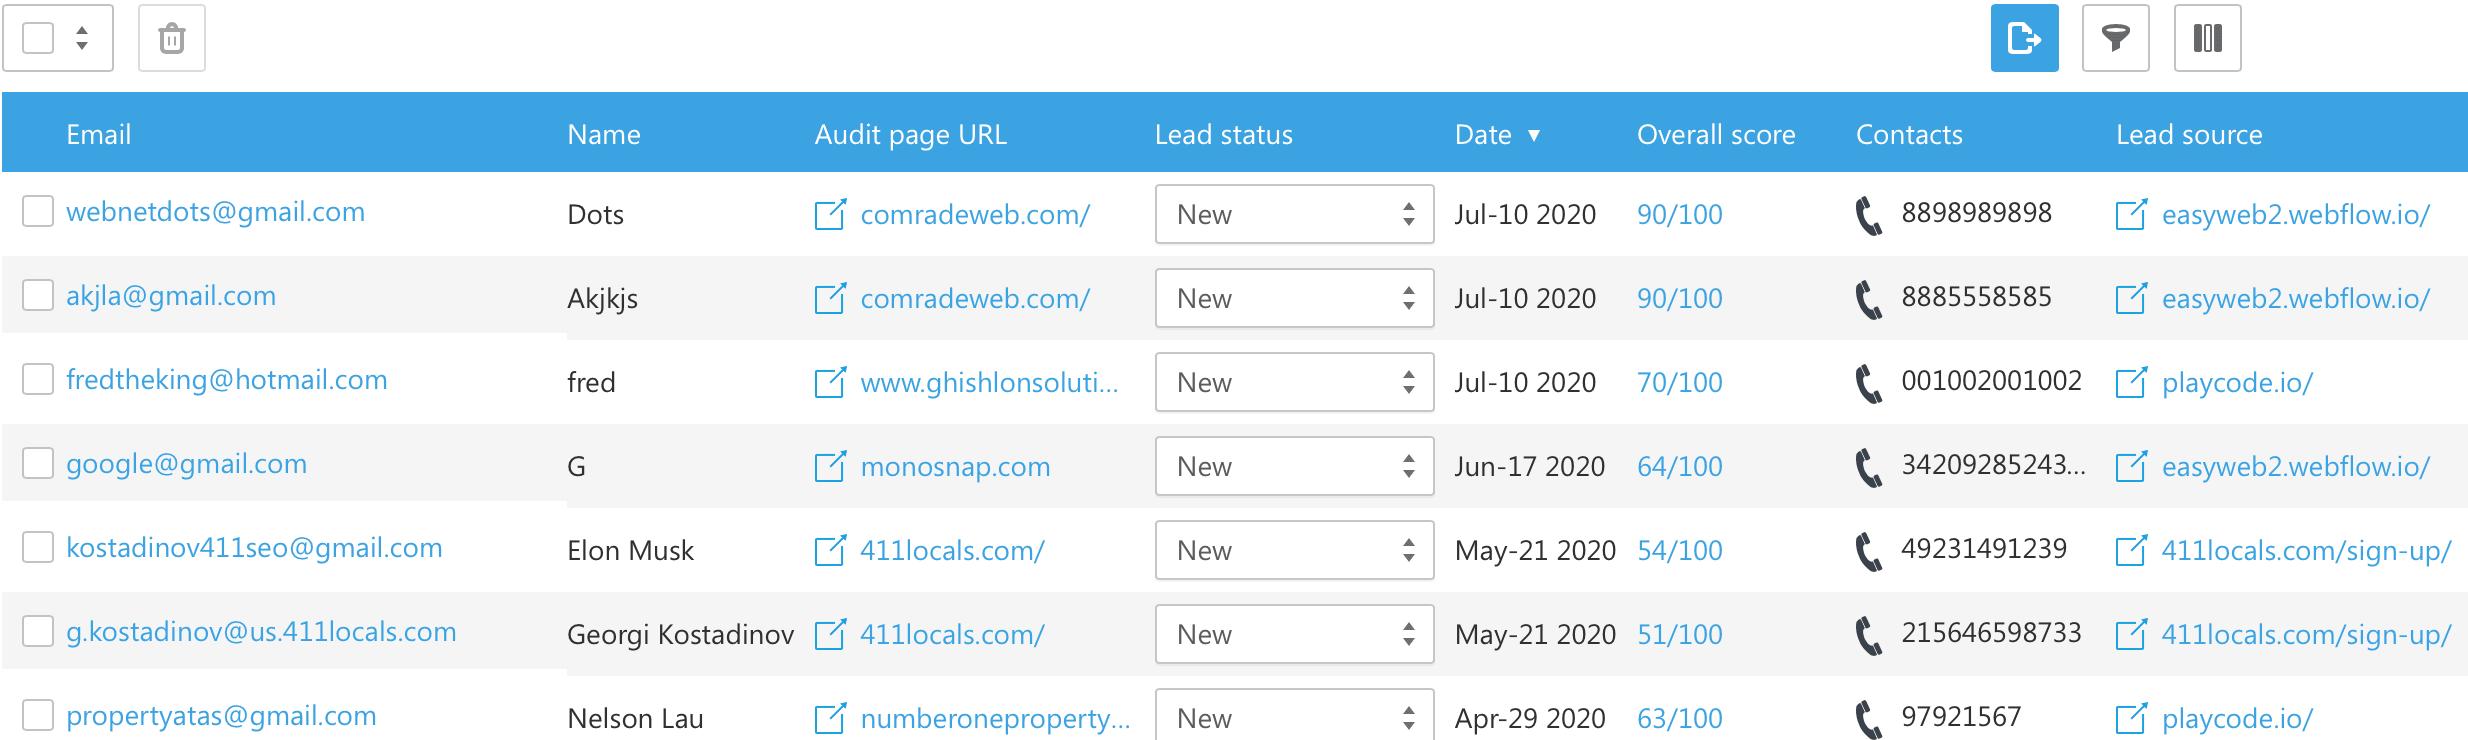 Lead generator contact info